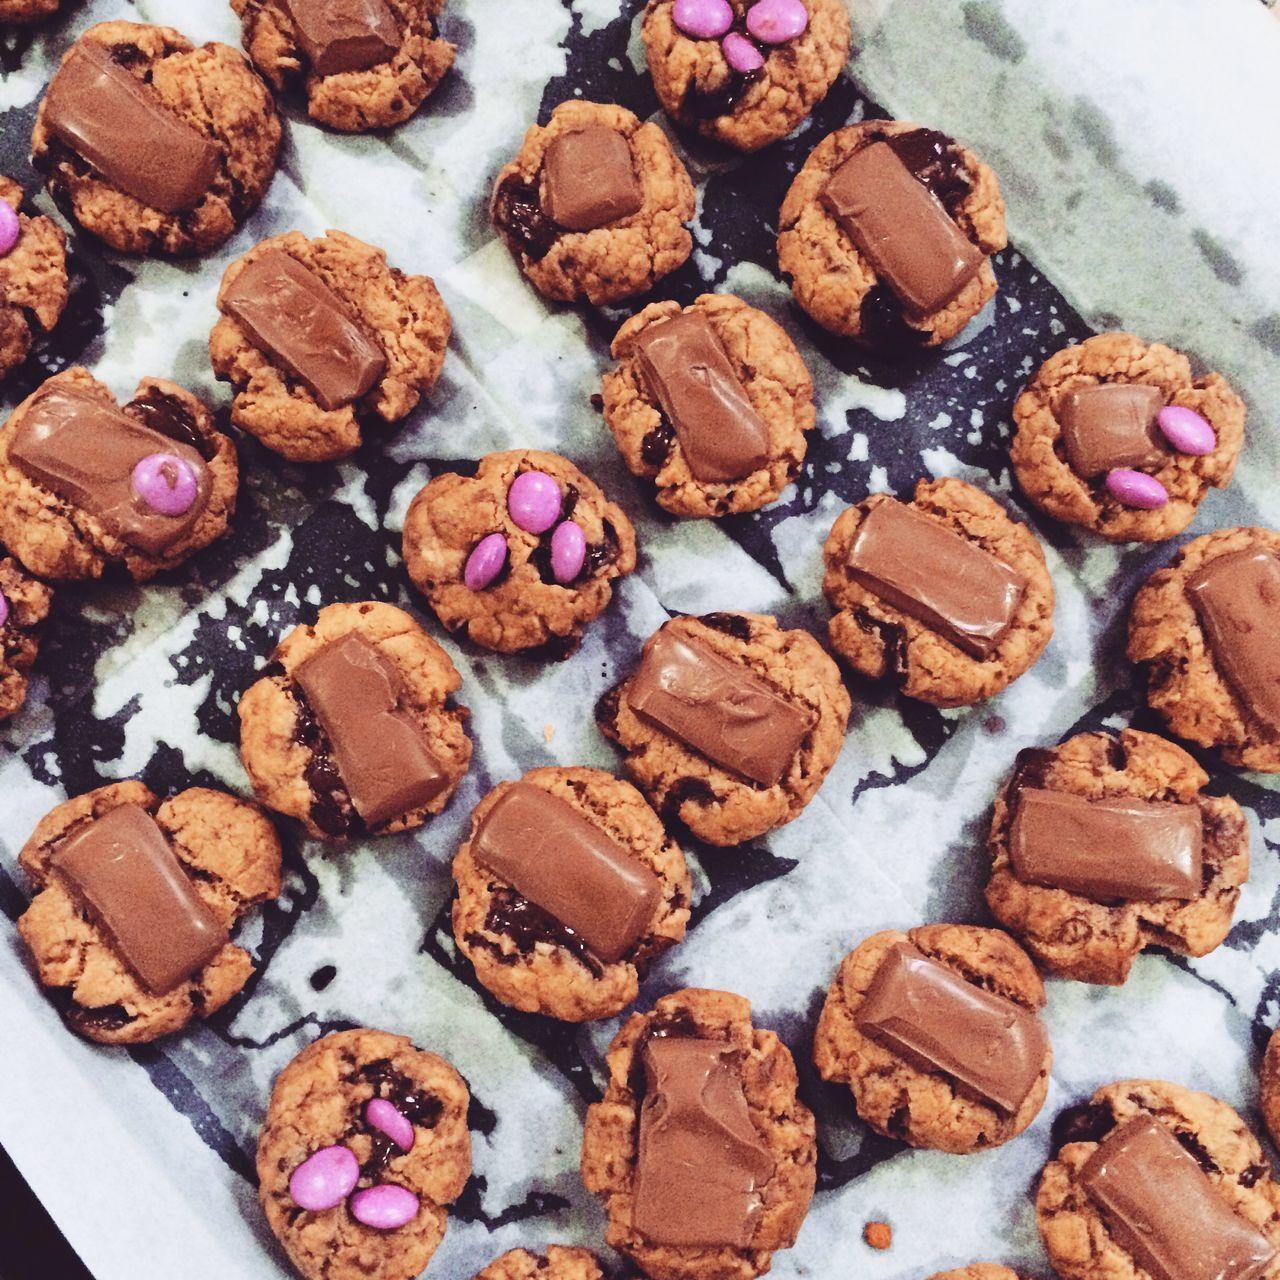 High Angle View Of Chocolate Cookies